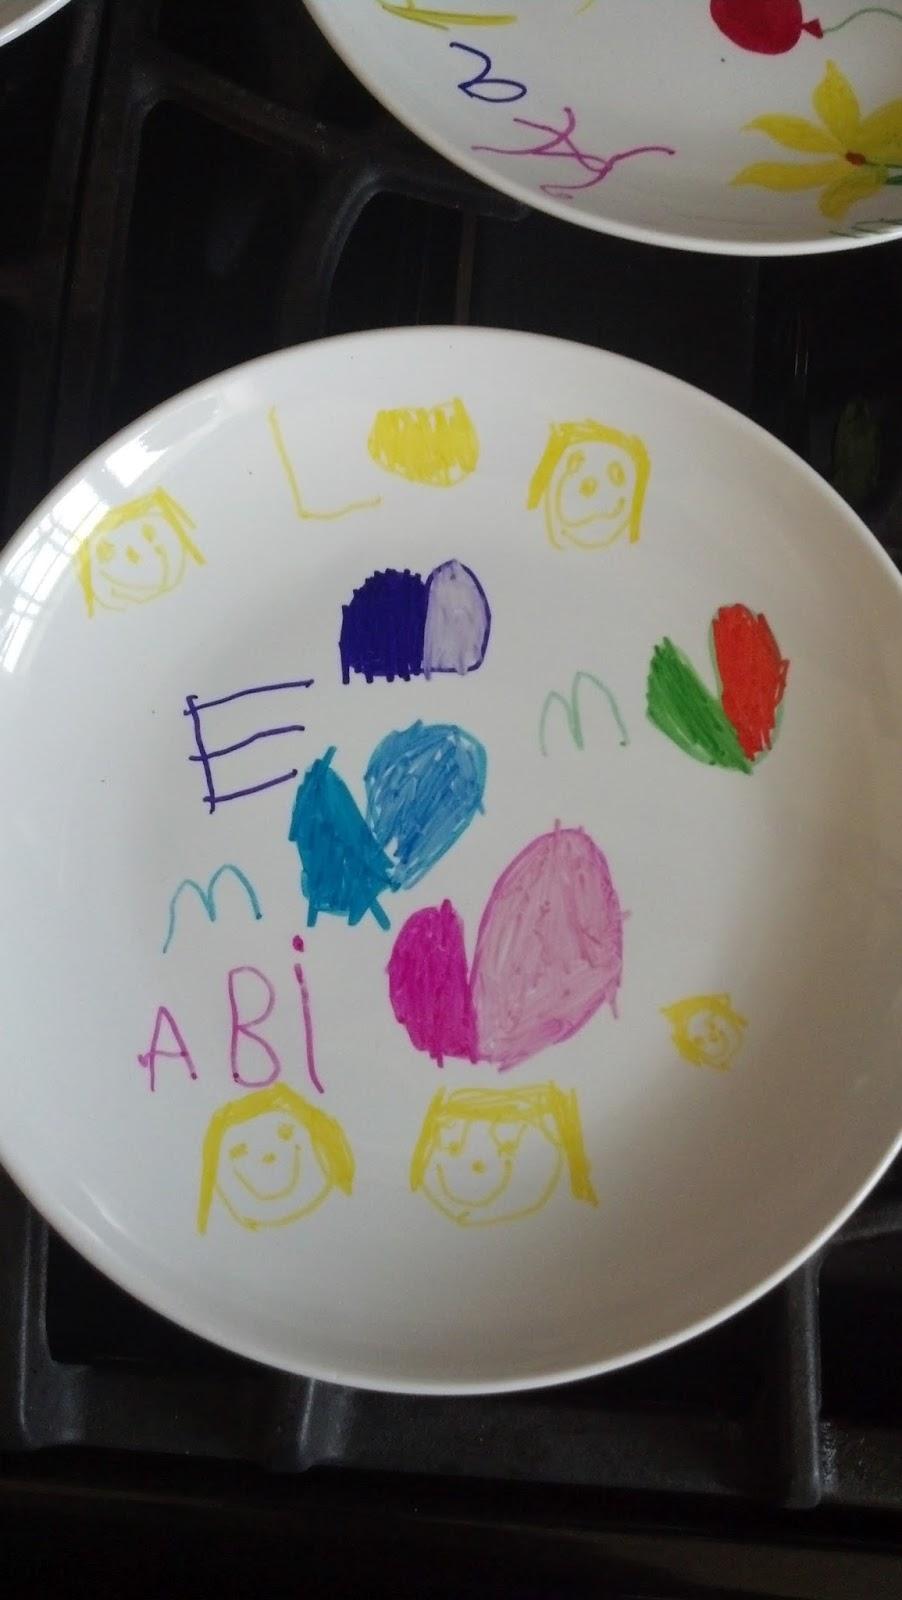 Abi's plate